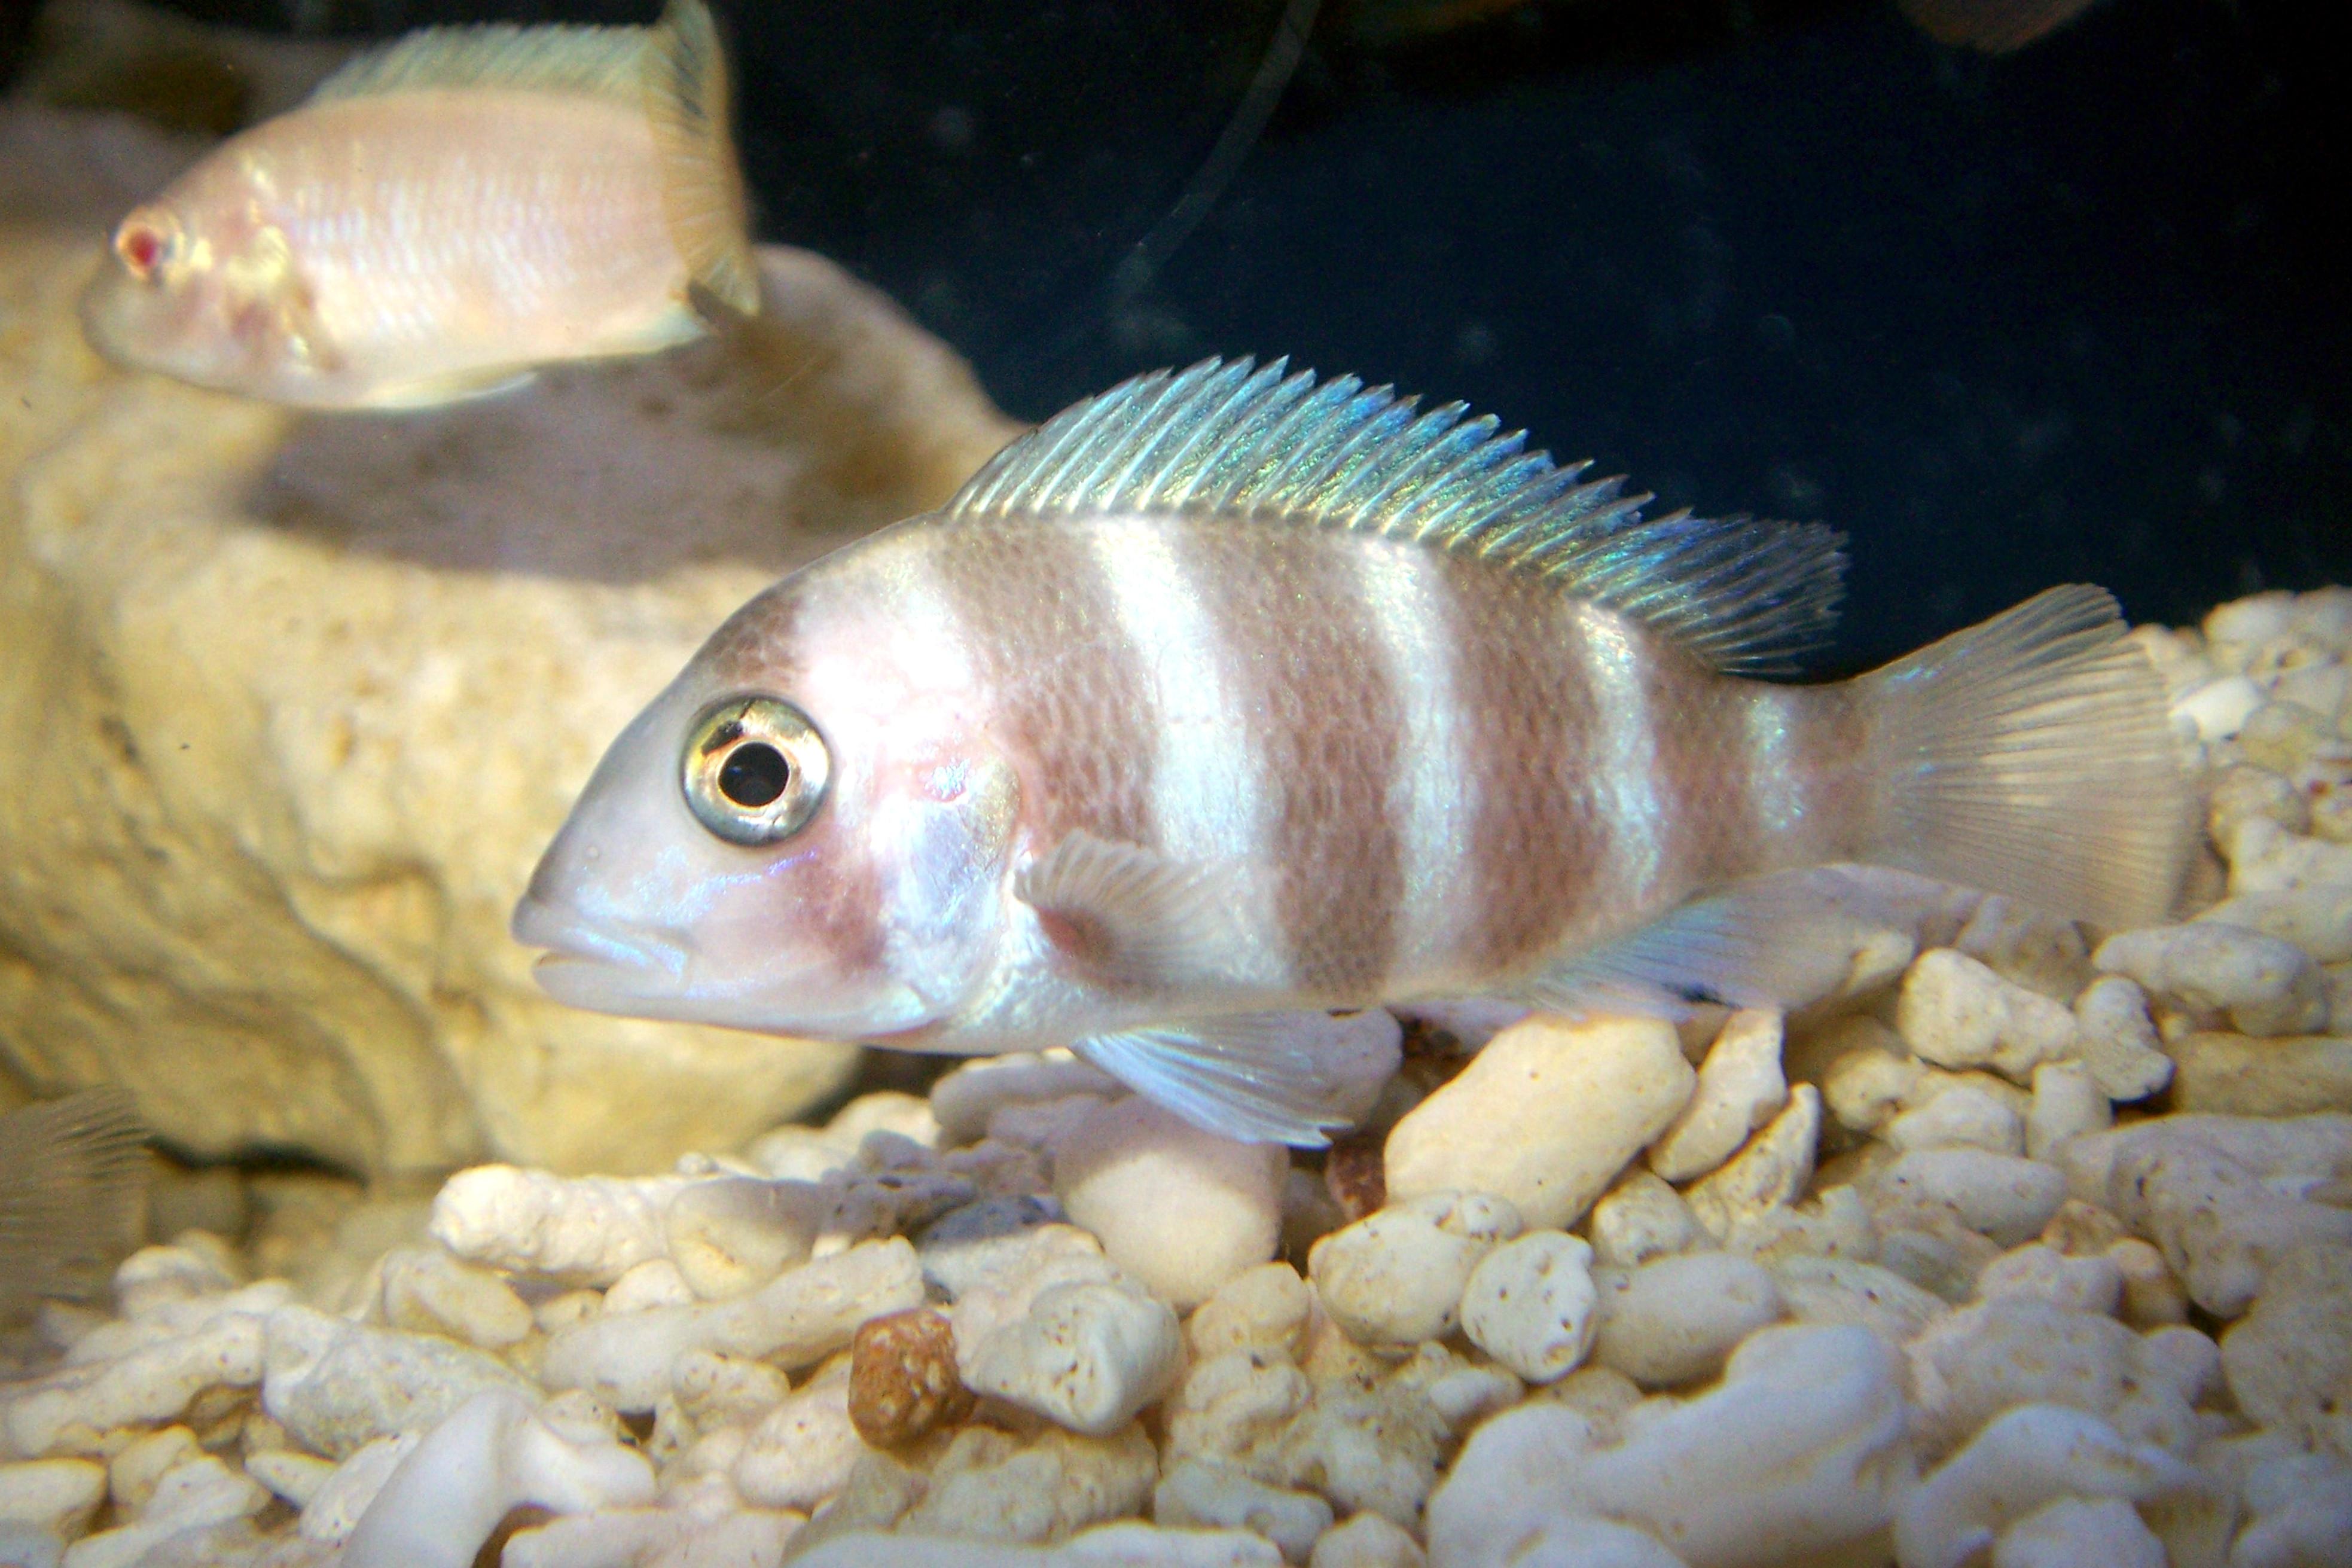 Baby Frontosa Cichlid cichlids.com: red fron...